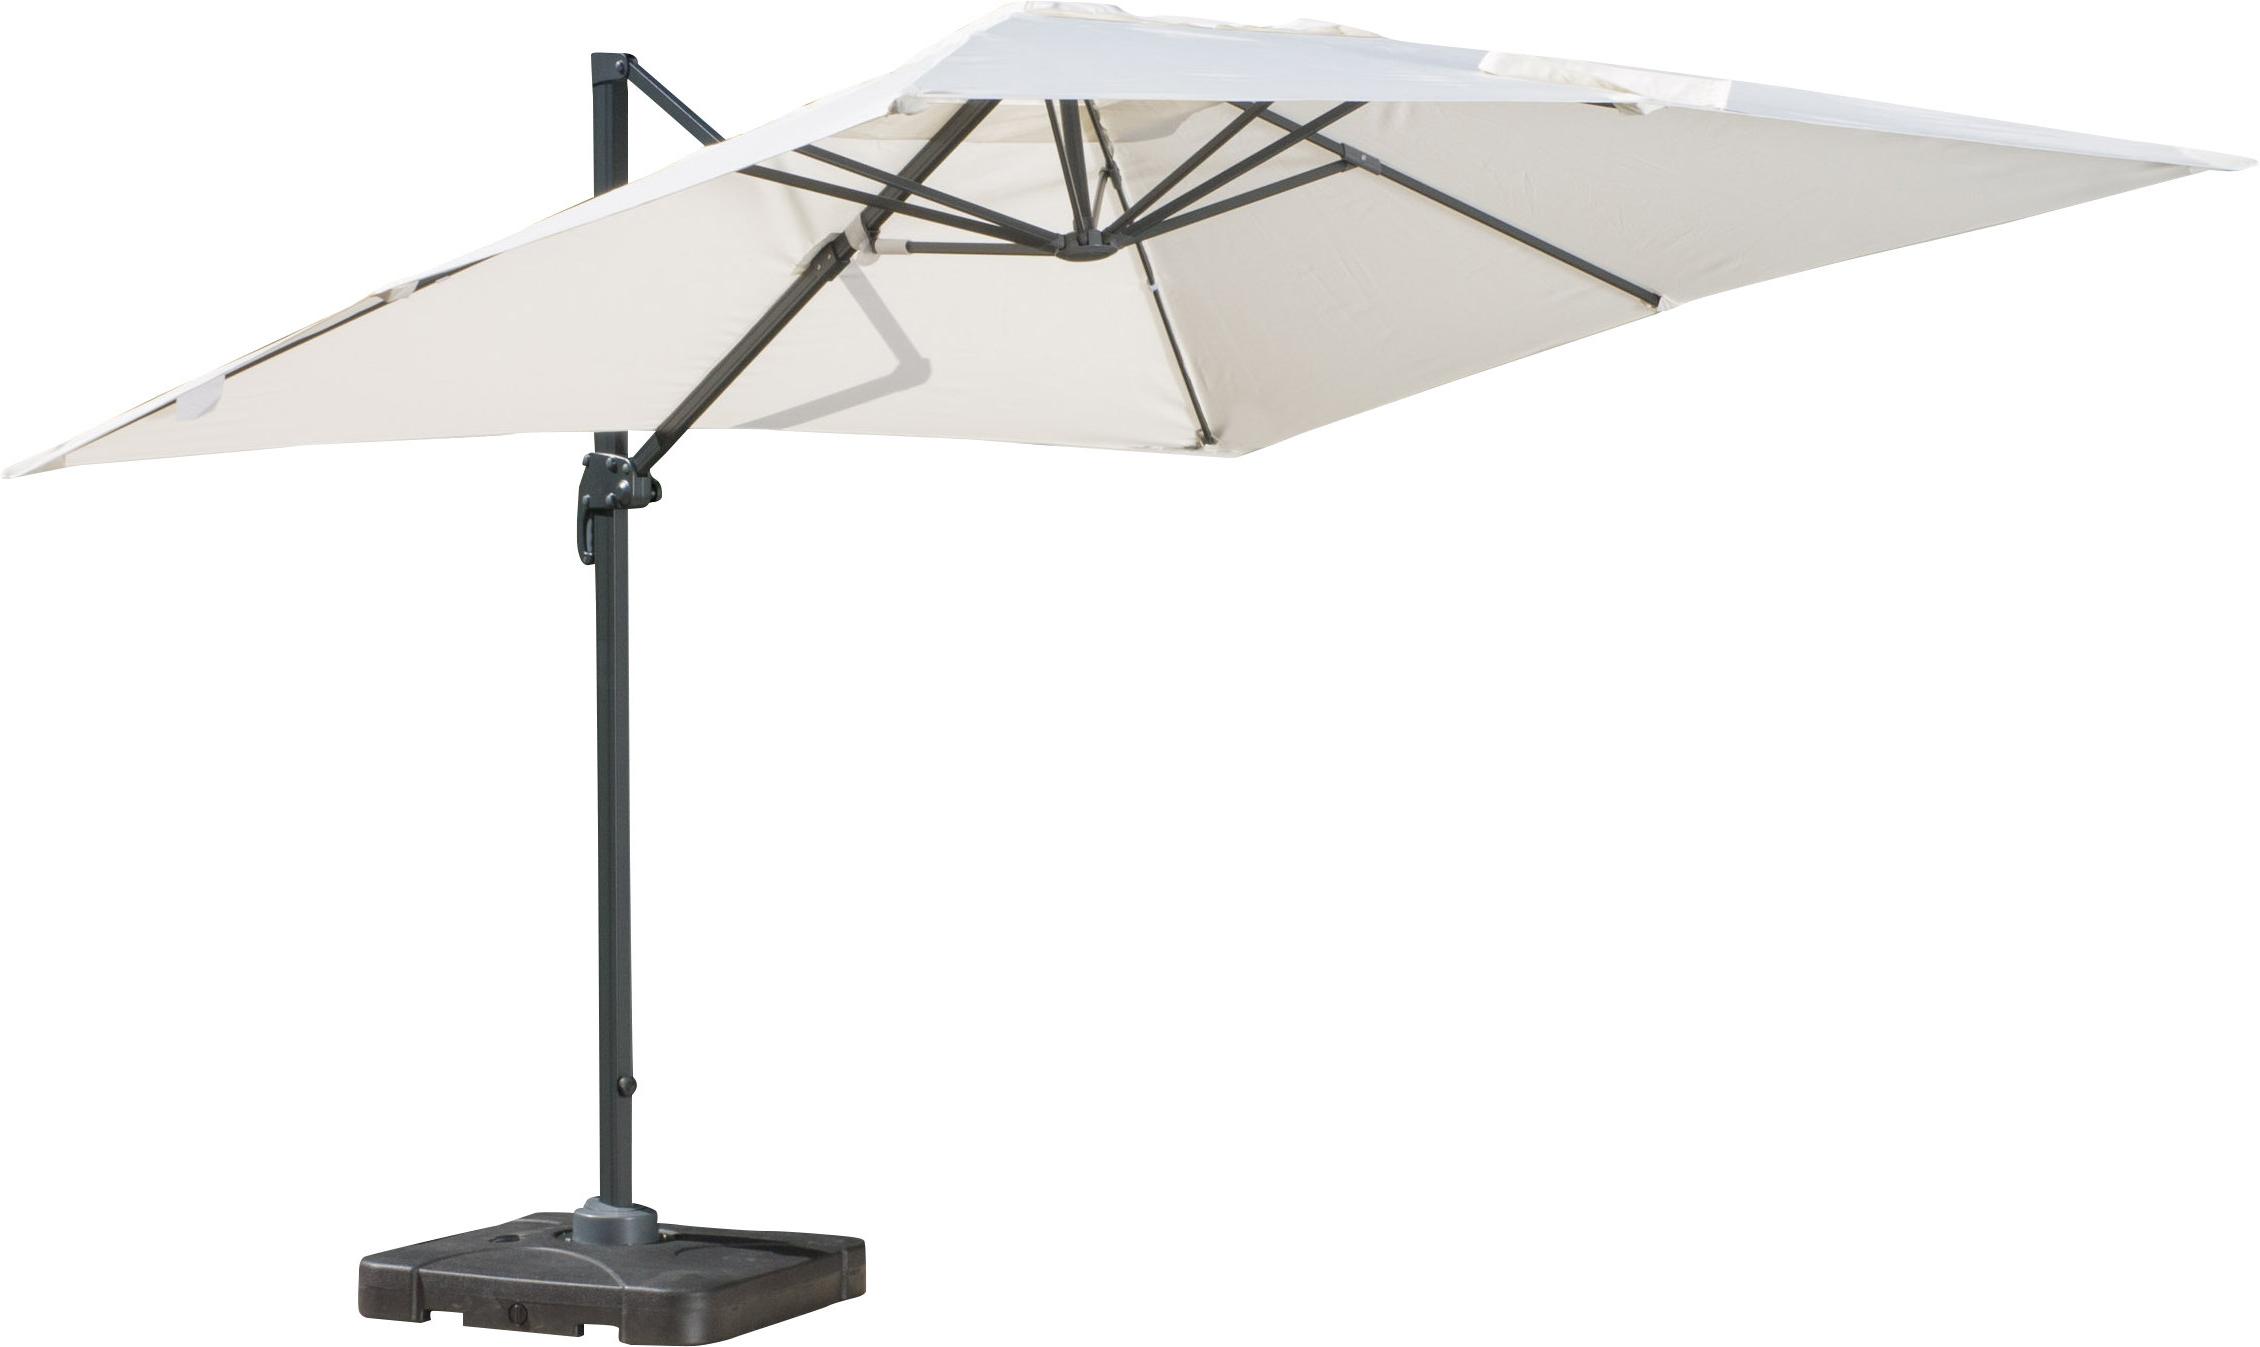 Vassalboro Cantilever Umbrellas Within Trendy Boracay 10' Square Cantilever Umbrella (View 20 of 20)